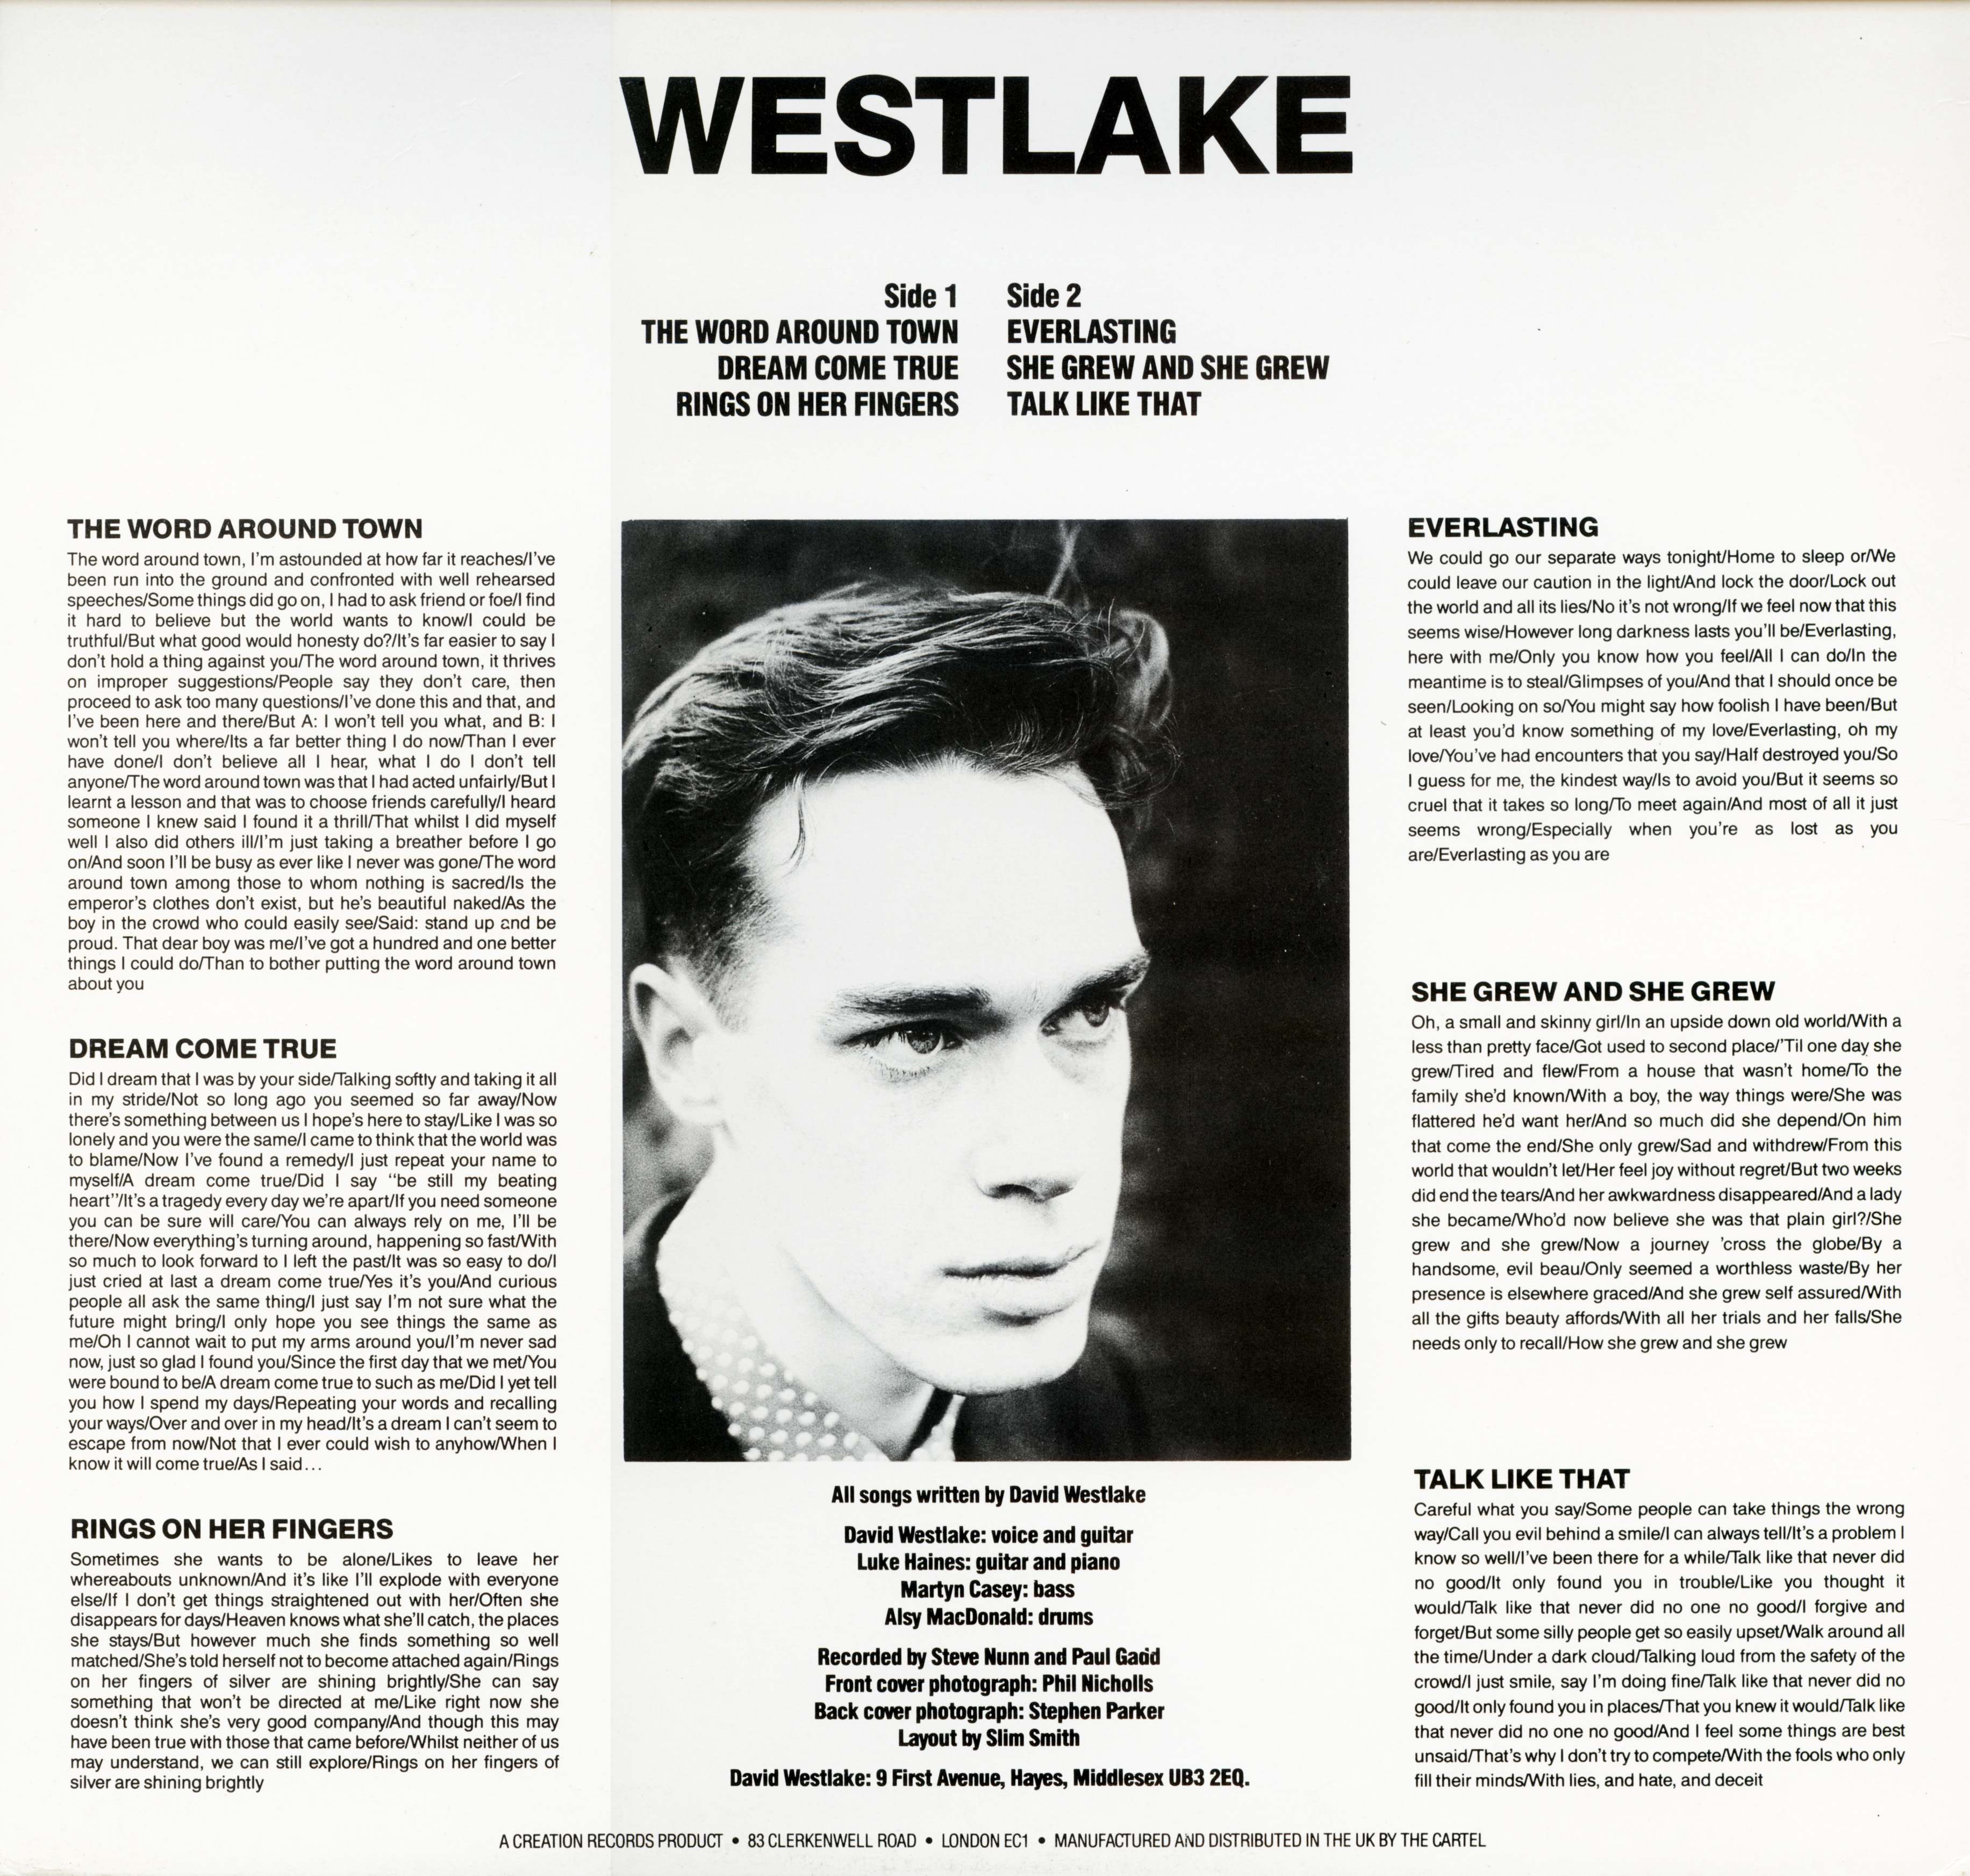 westlake back